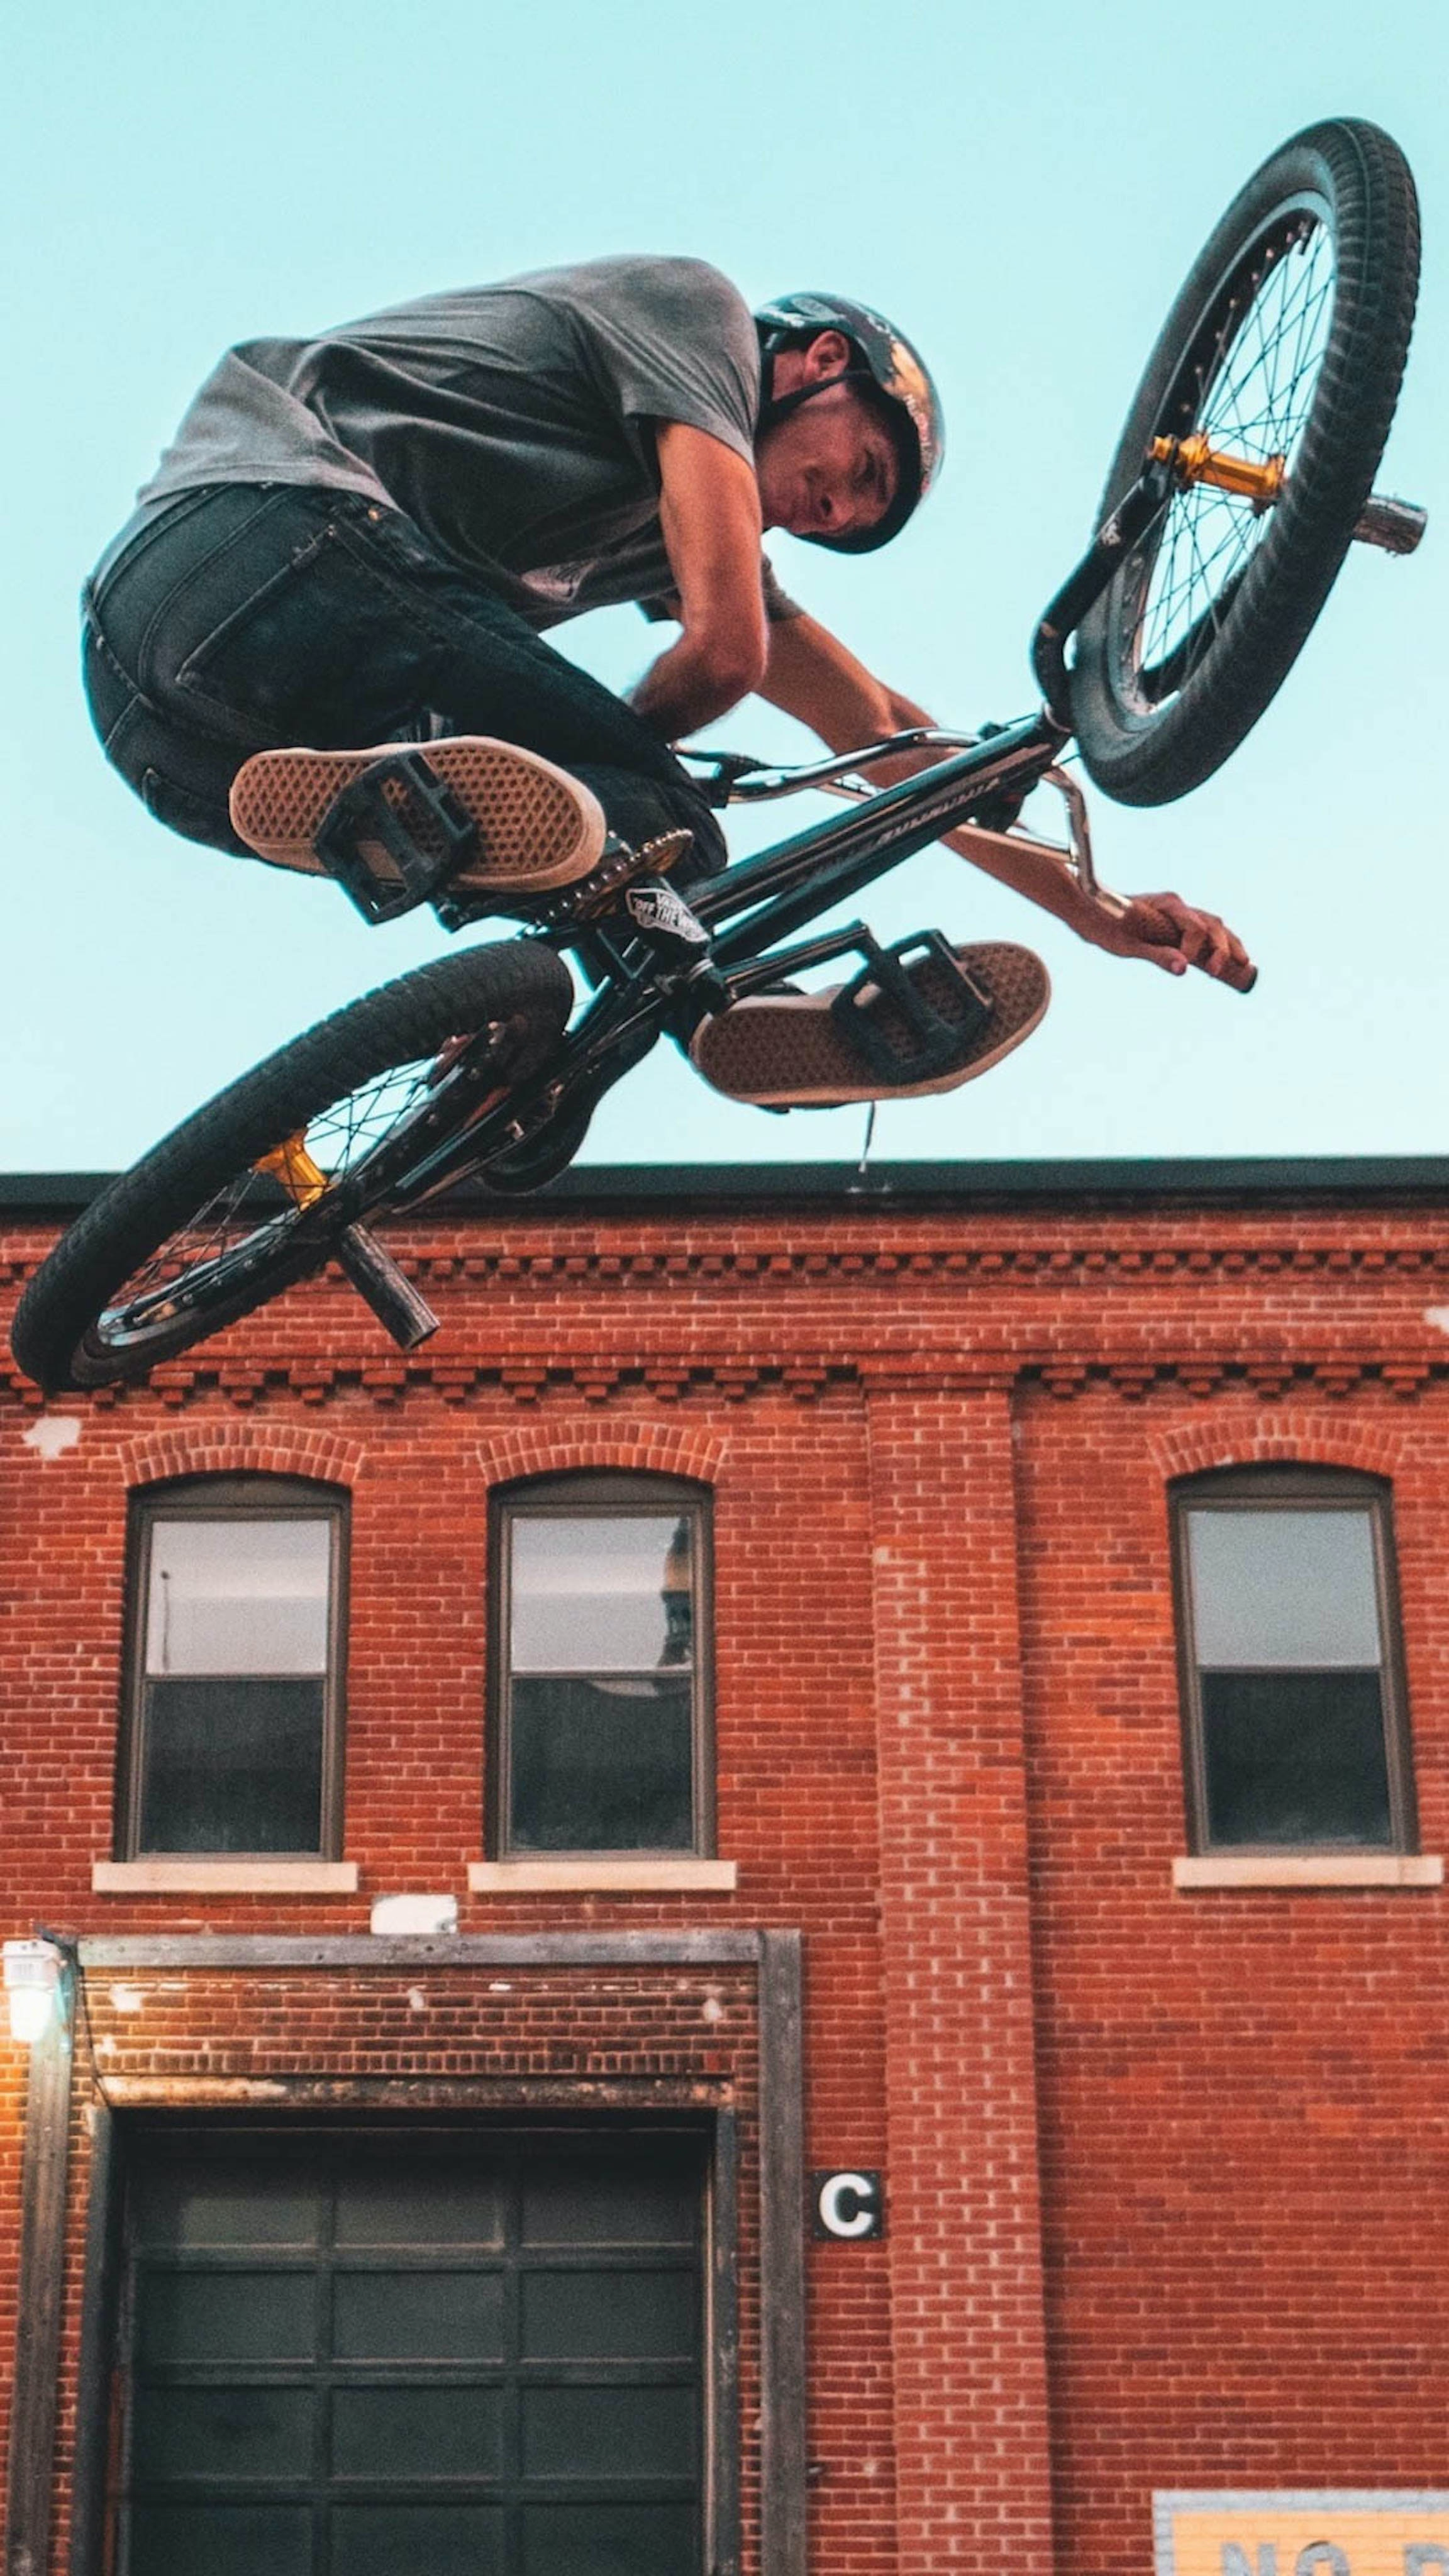 man riding on black BMX bike in mid-air